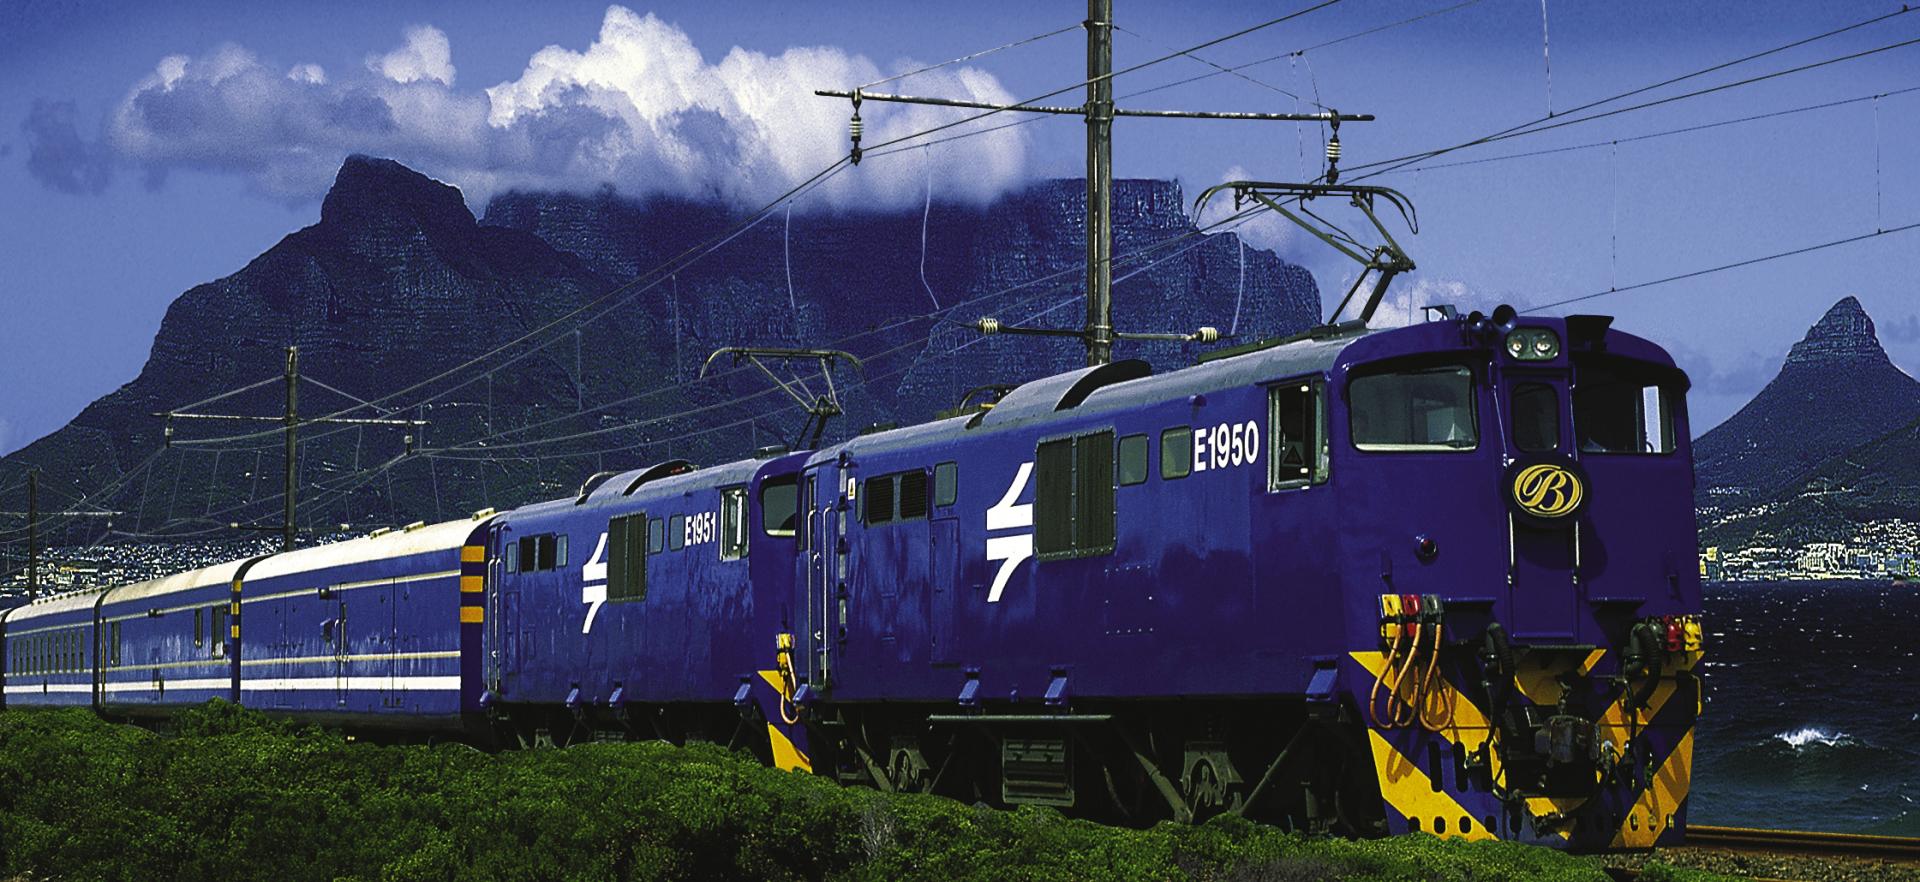 blue-train-en-rovos-rail-luxe-treinreizen-zuid-afrika_4-1-800x600.jpg